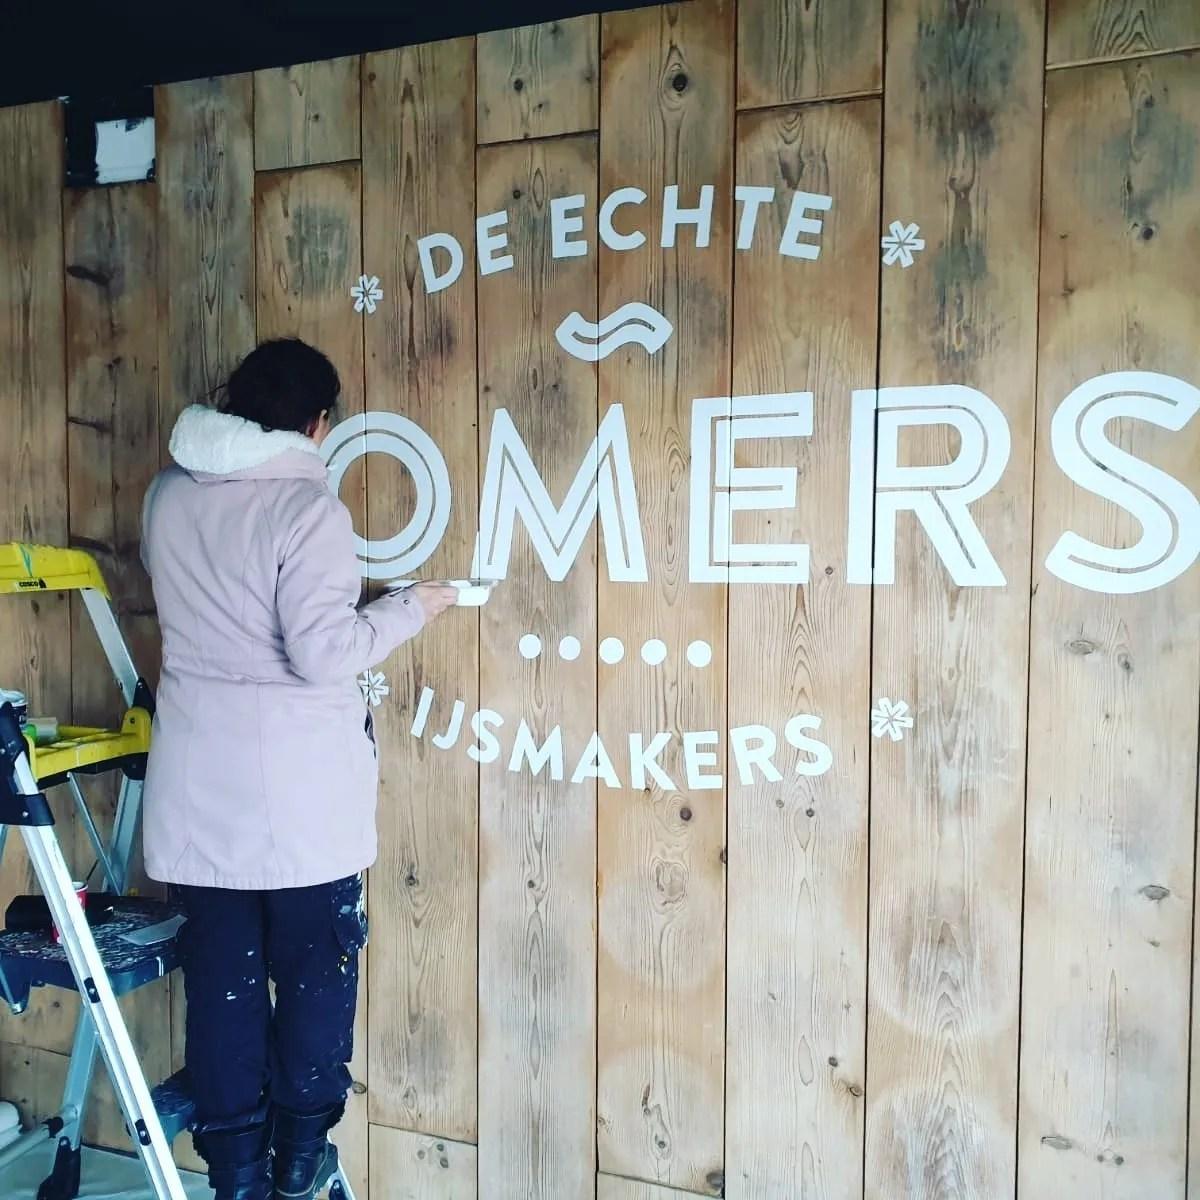 logo op hout laten schilderen